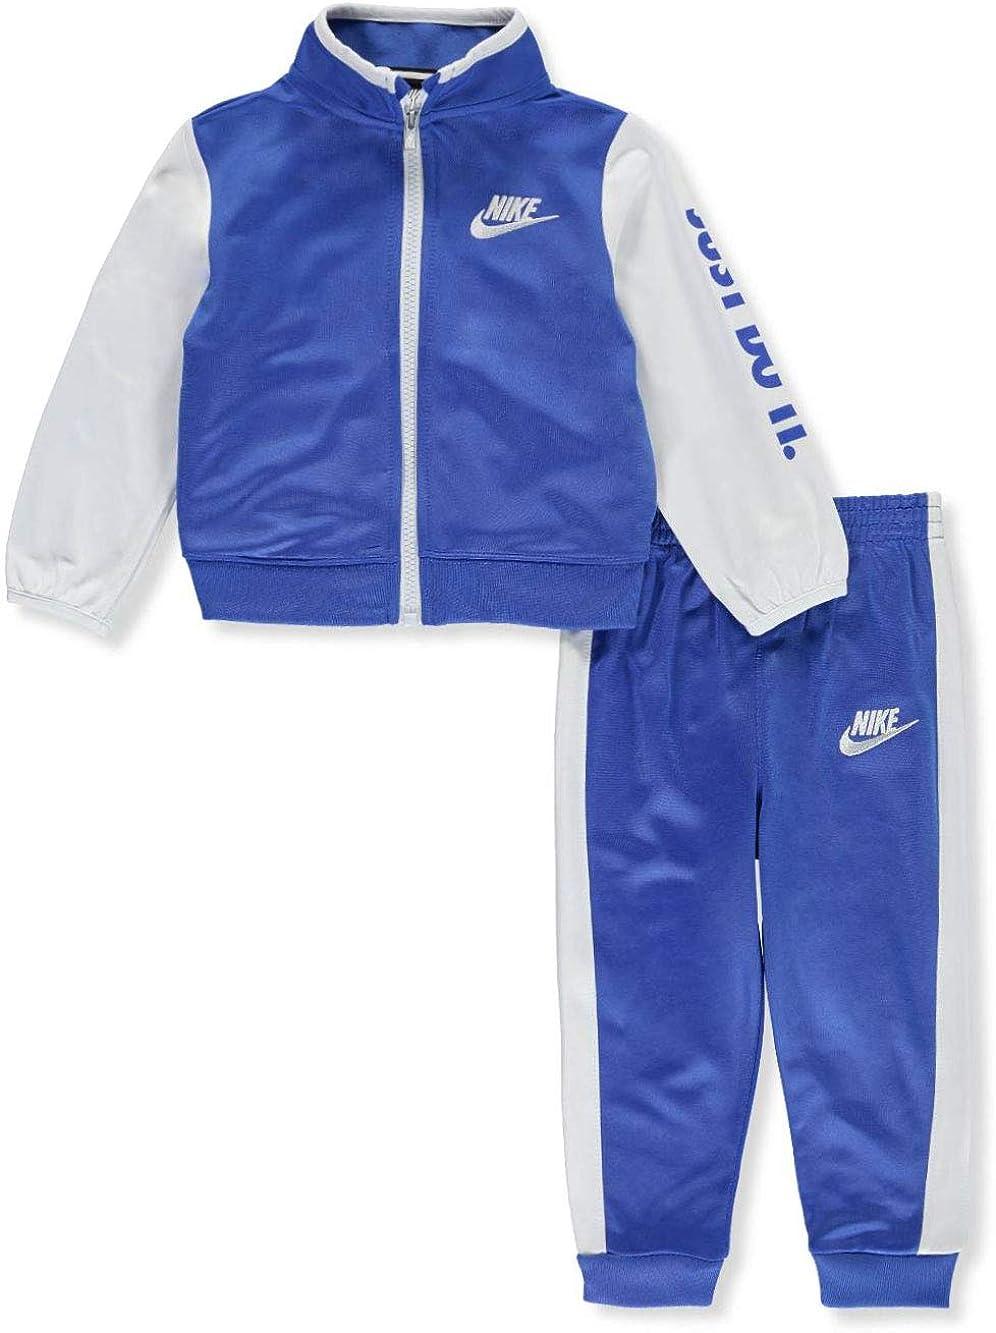 Nike - Chándal para niños (2 piezas) - - 24 meses: Amazon.es: Ropa ...